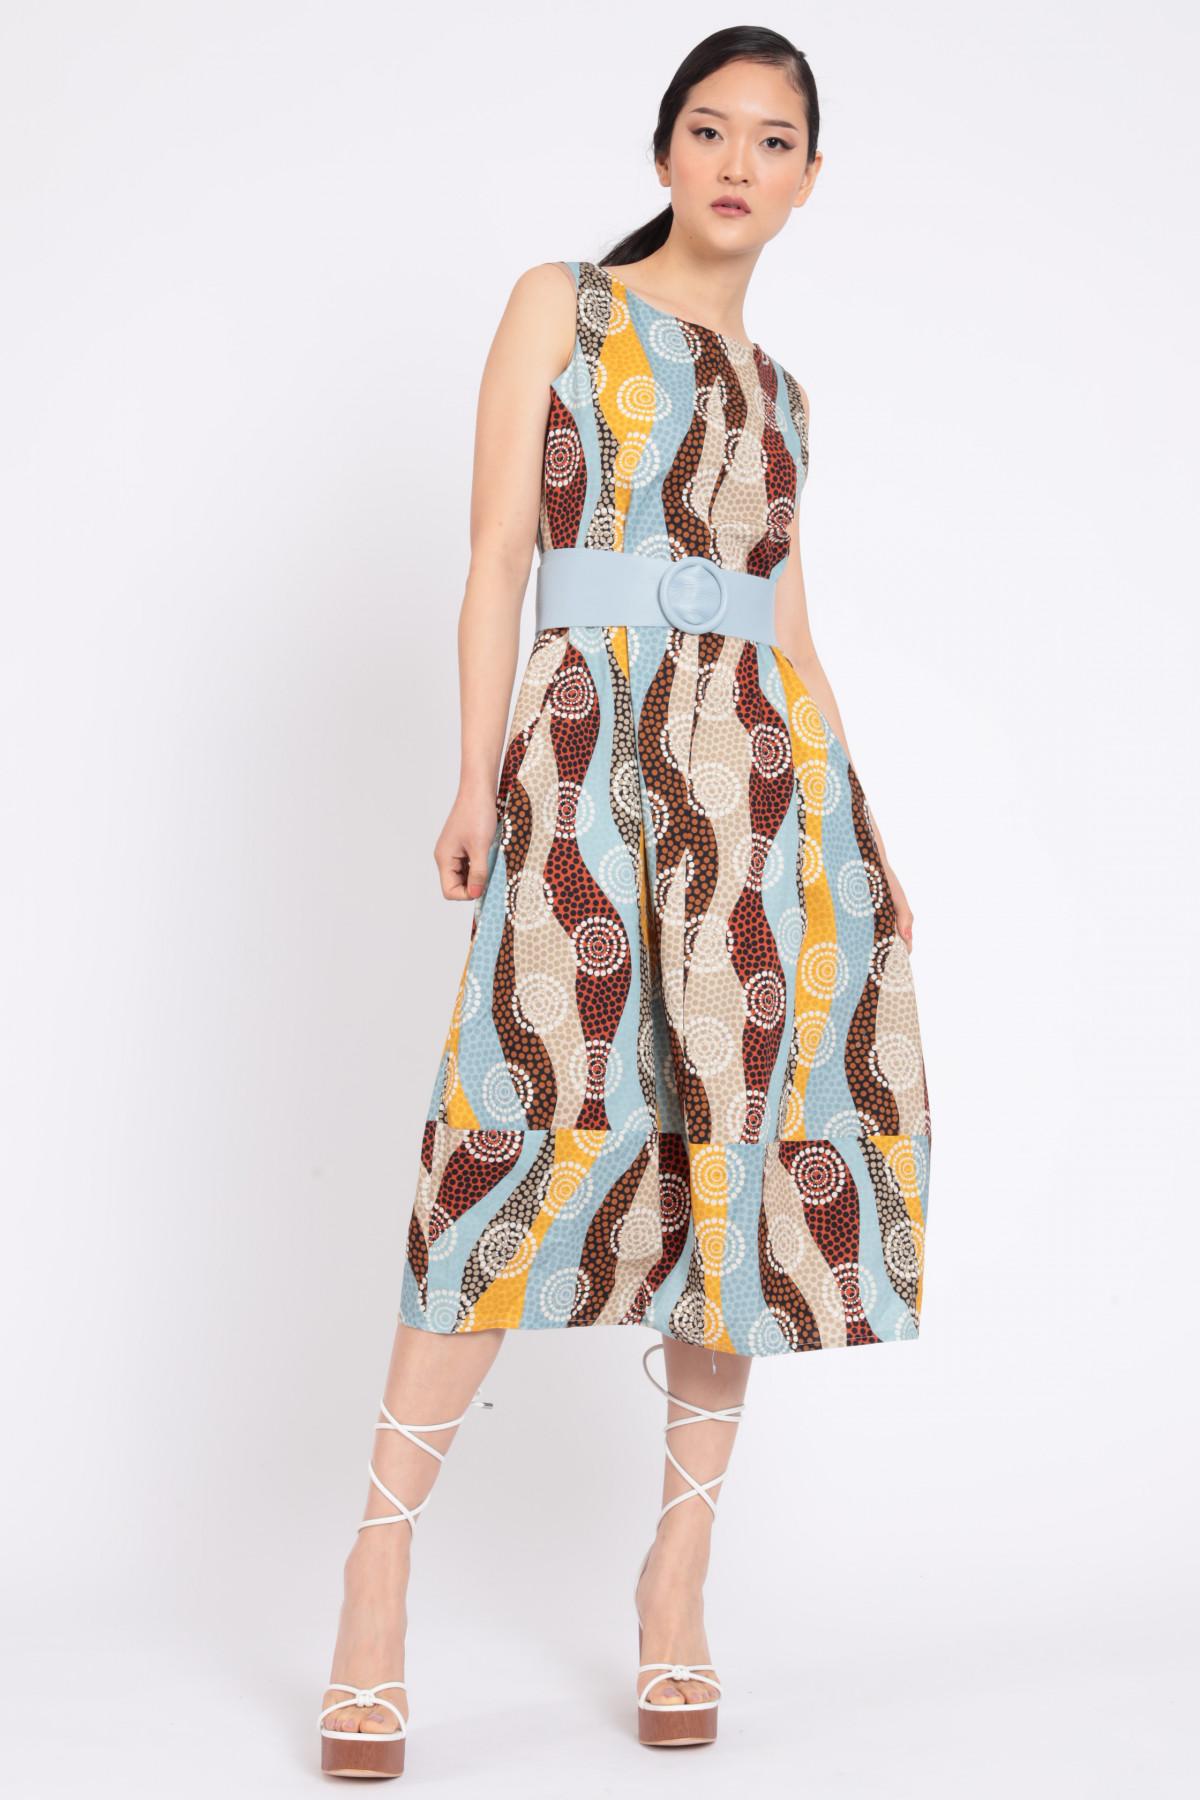 Sleeveless Dress in Optical Fantasy